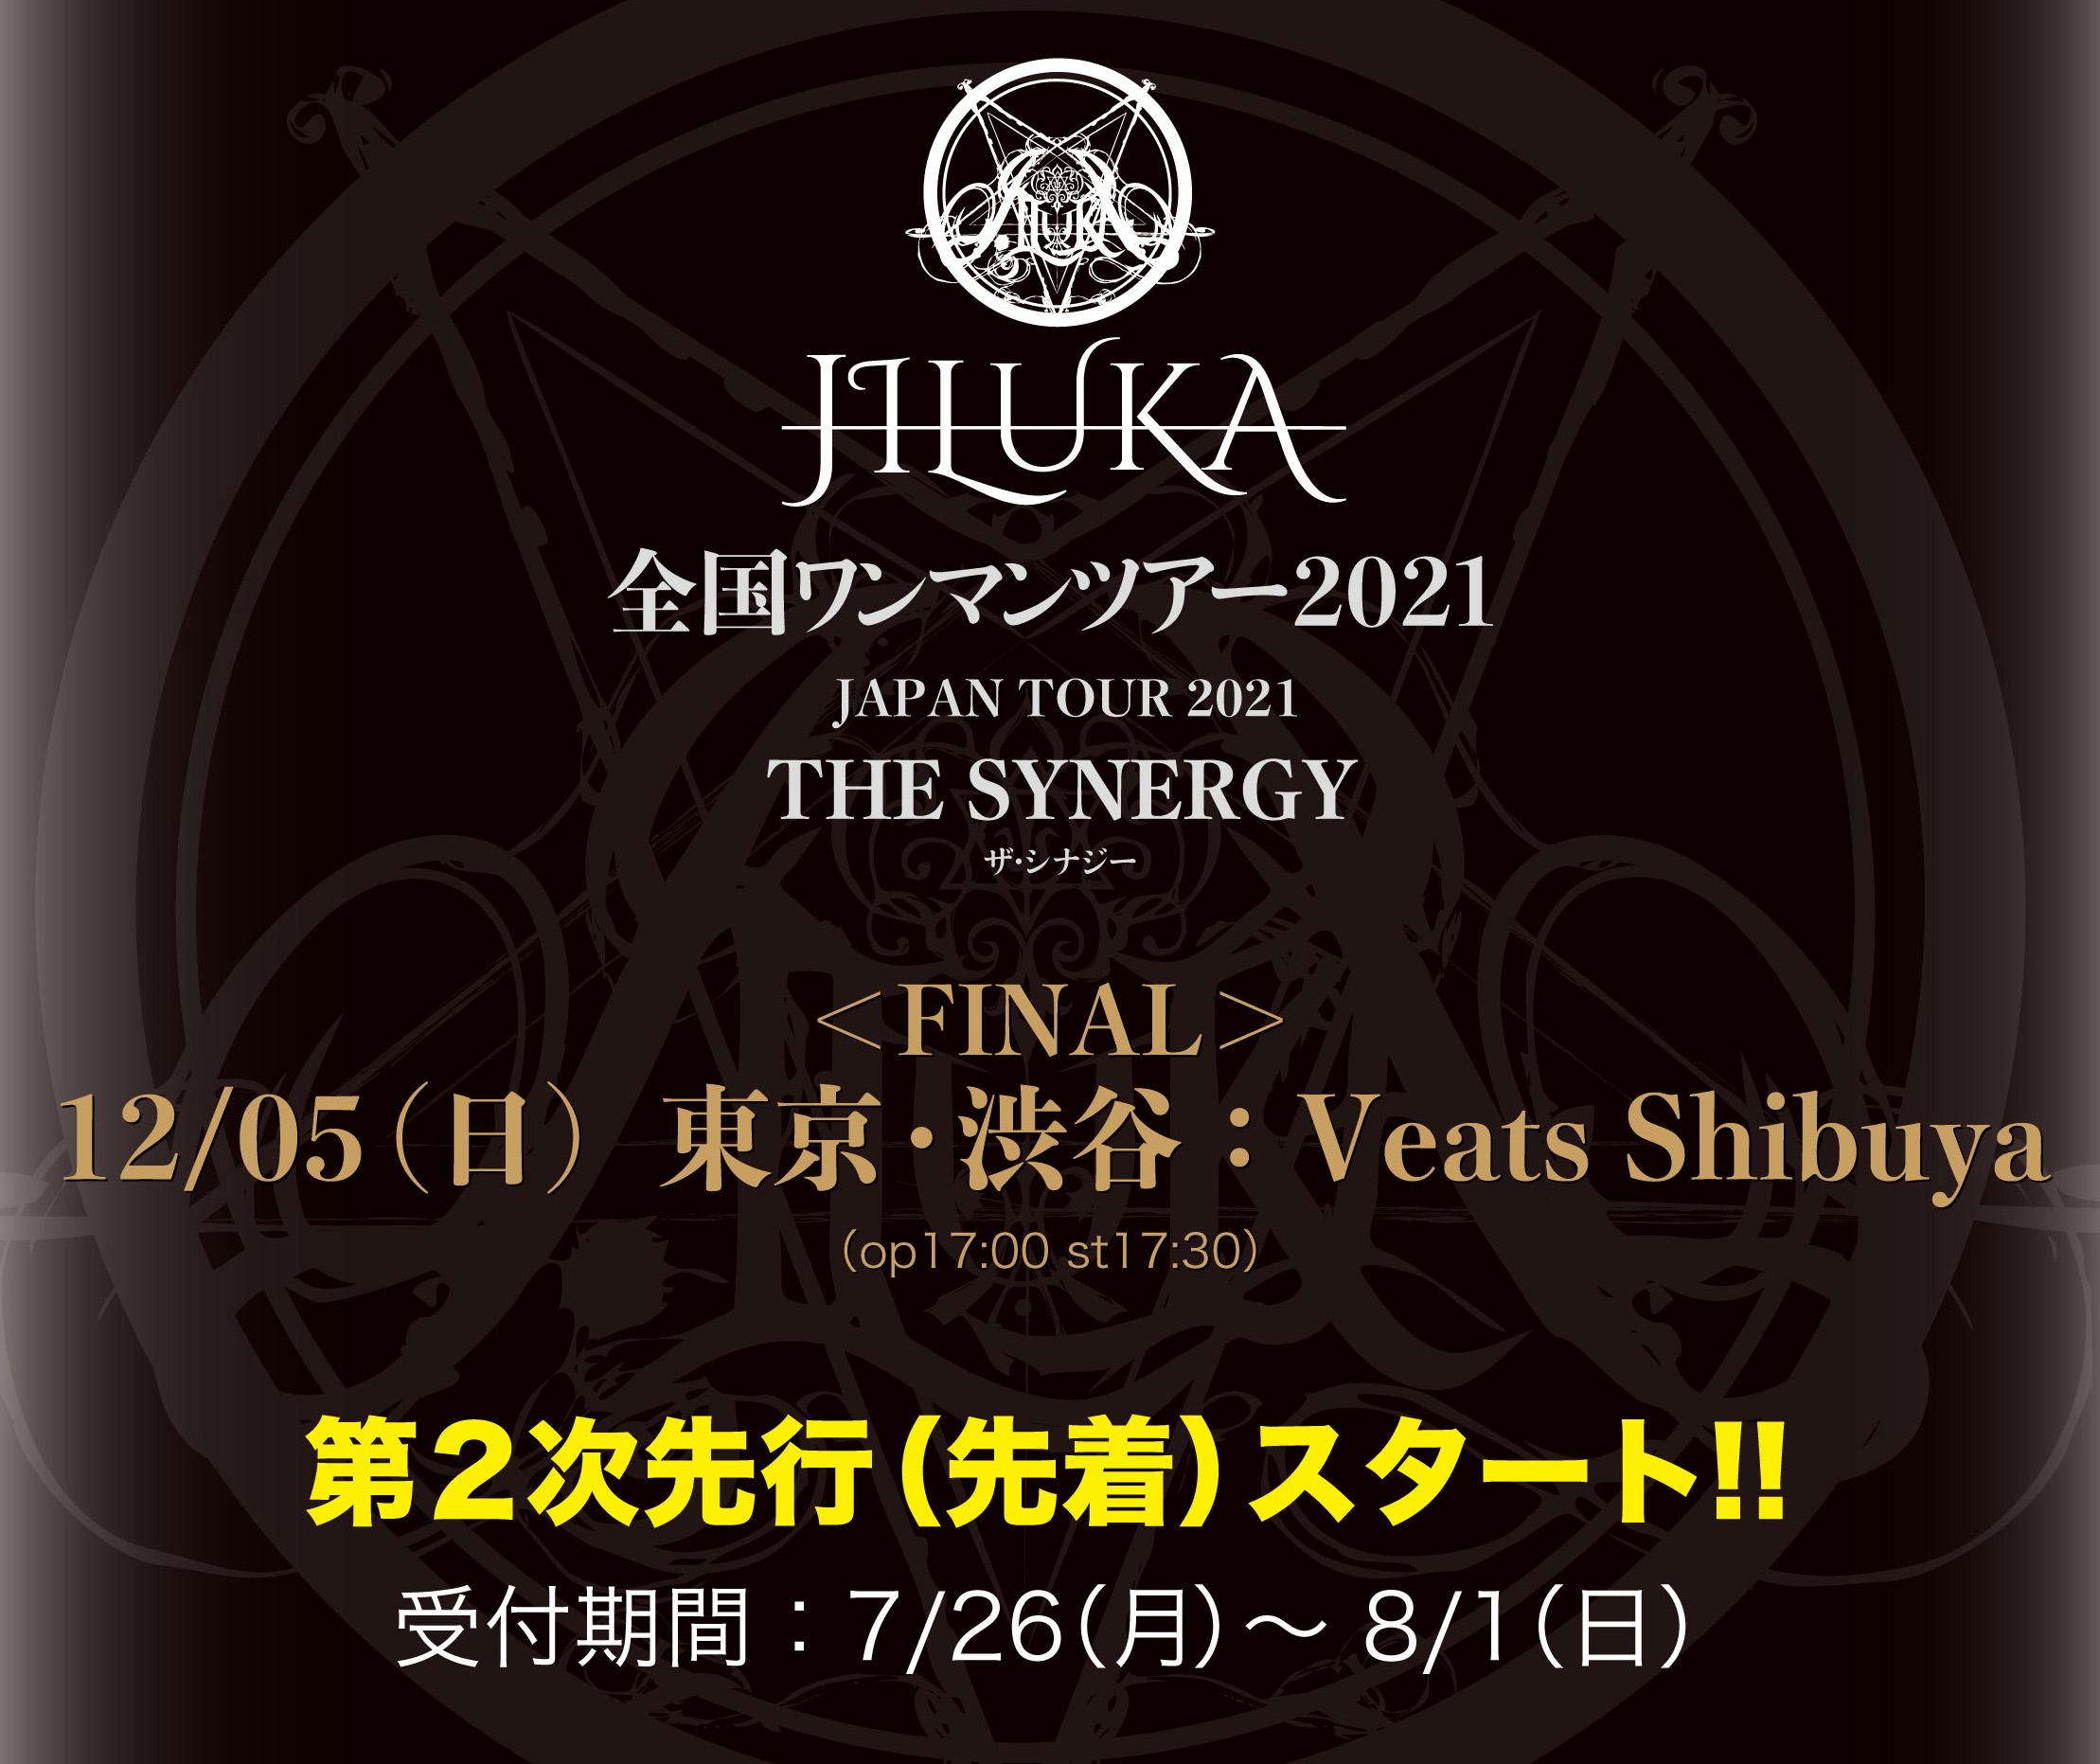 JILUKA_omt2021_ファイナル先行